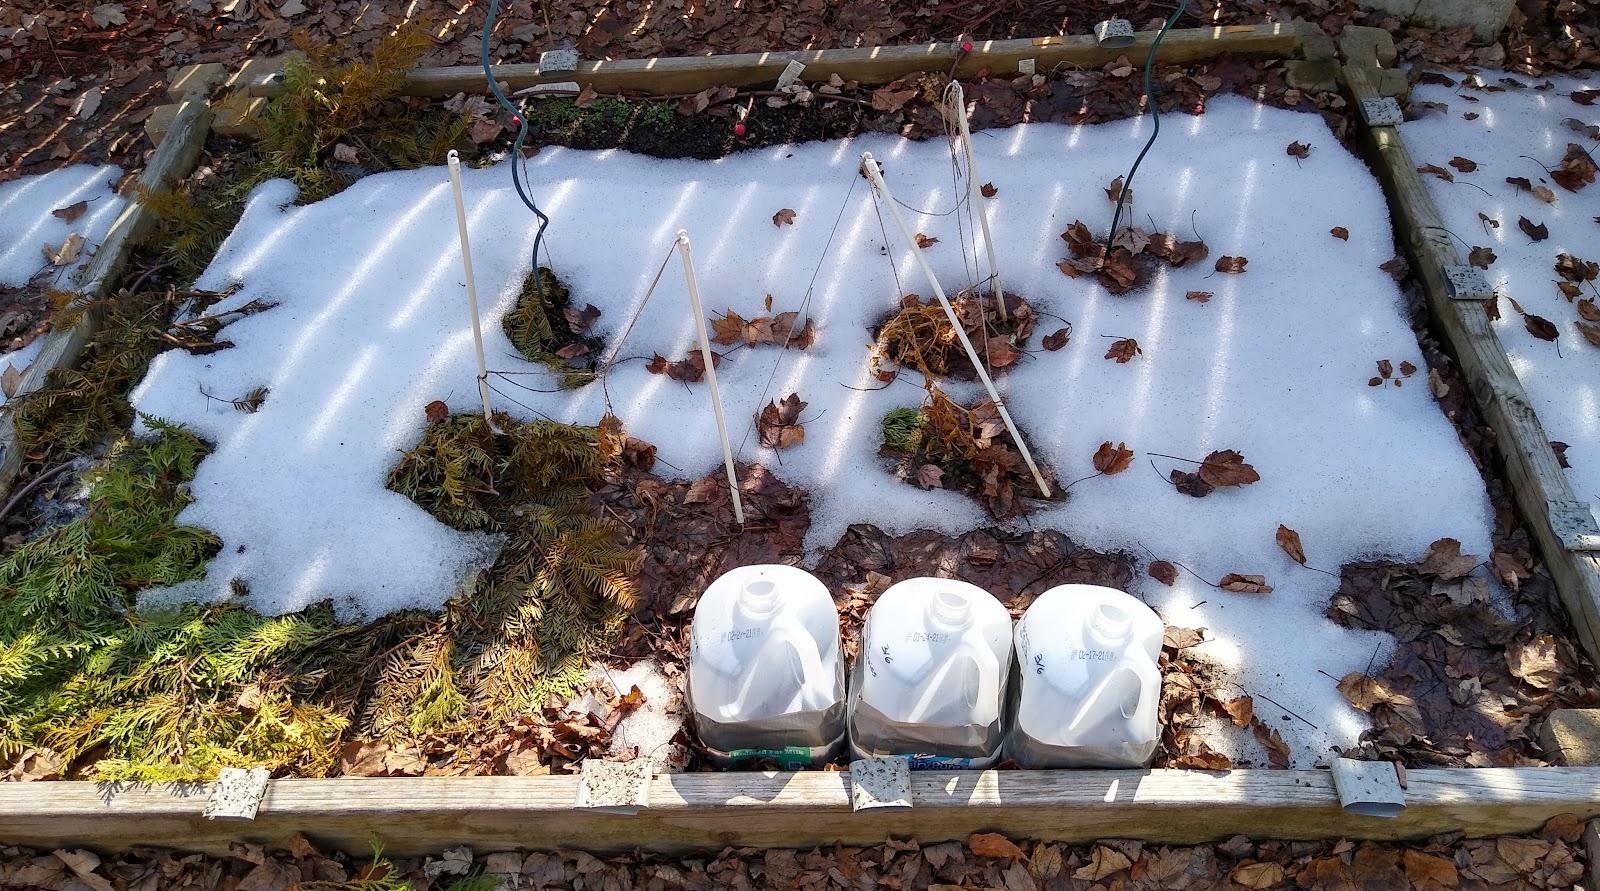 winter sowing in a raised bed veggie garden